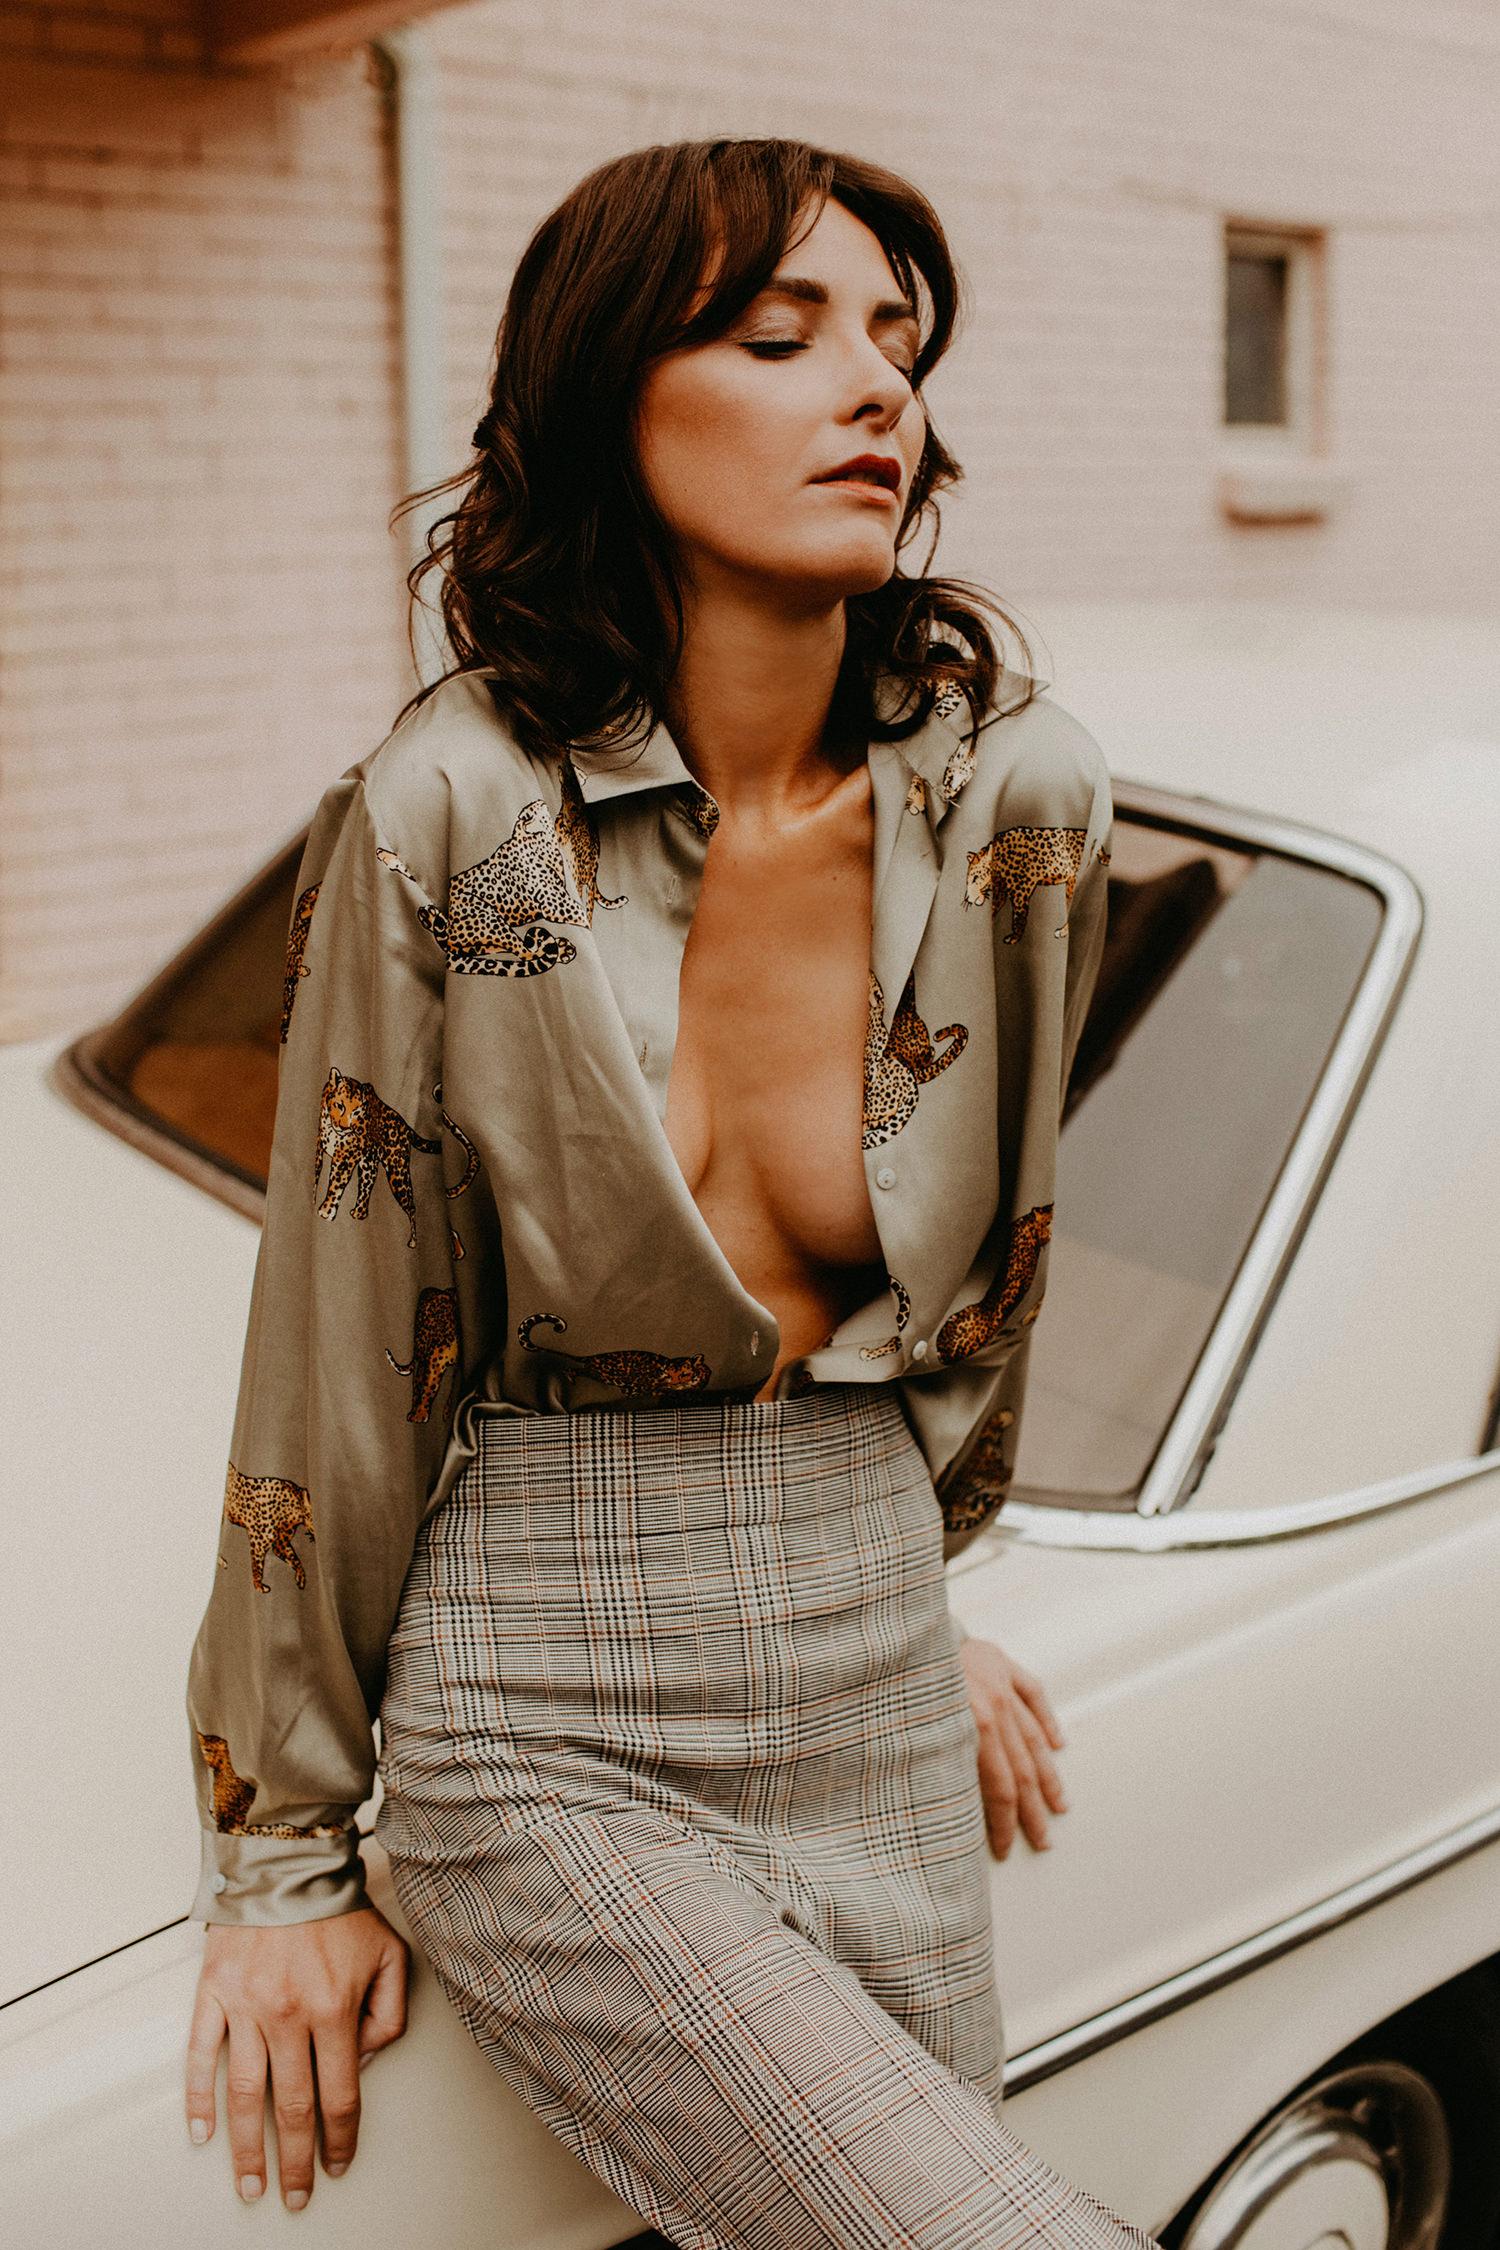 Zuerich-Fashion-Fotograf-Fashionfotografie-Mode-Fotograf-Modefotografie-Anna-Fichtner-h-19